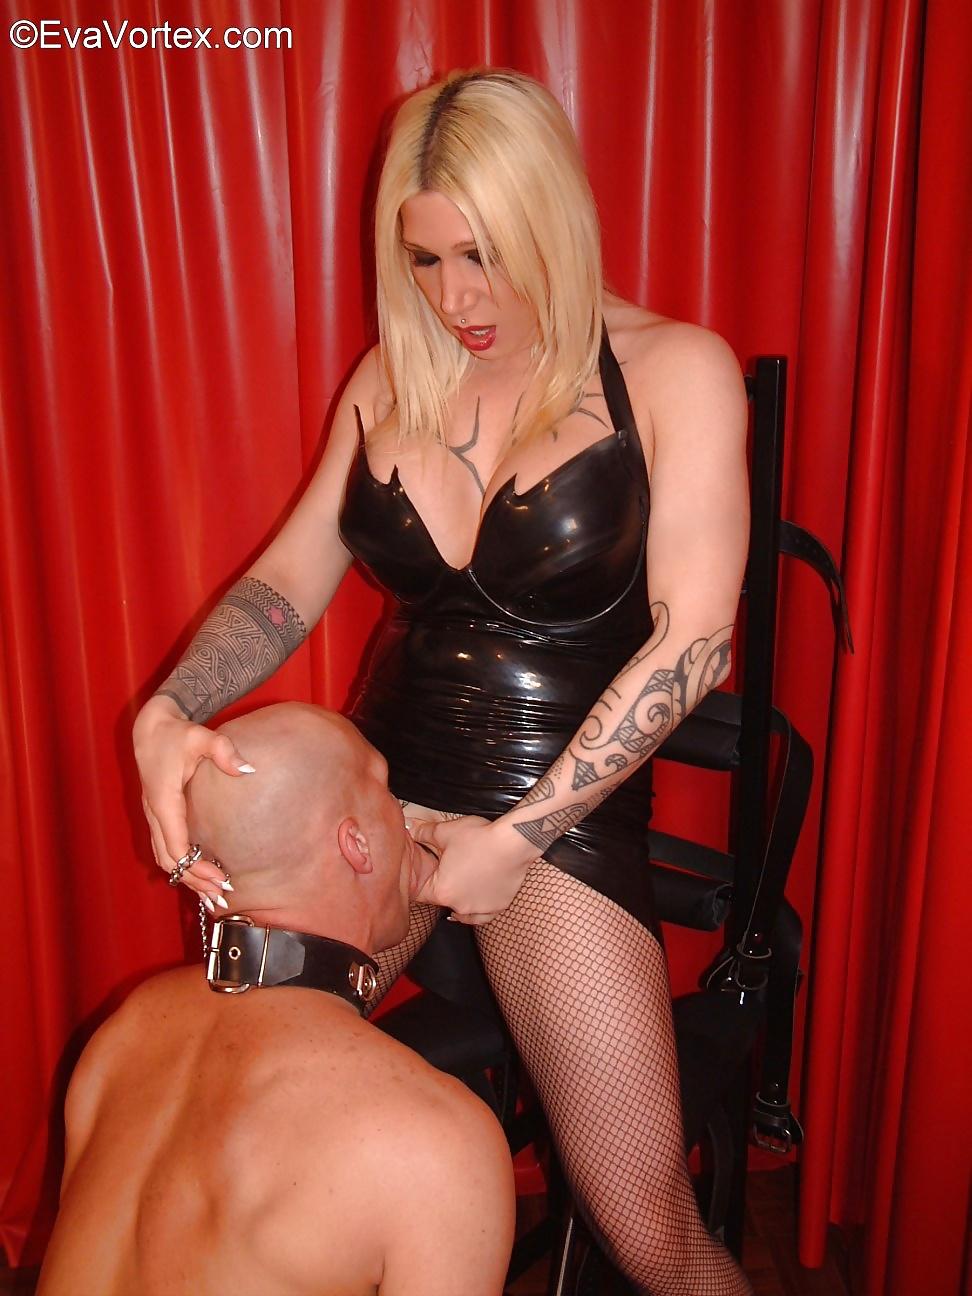 Pleasantville Transexual Nj Mistress